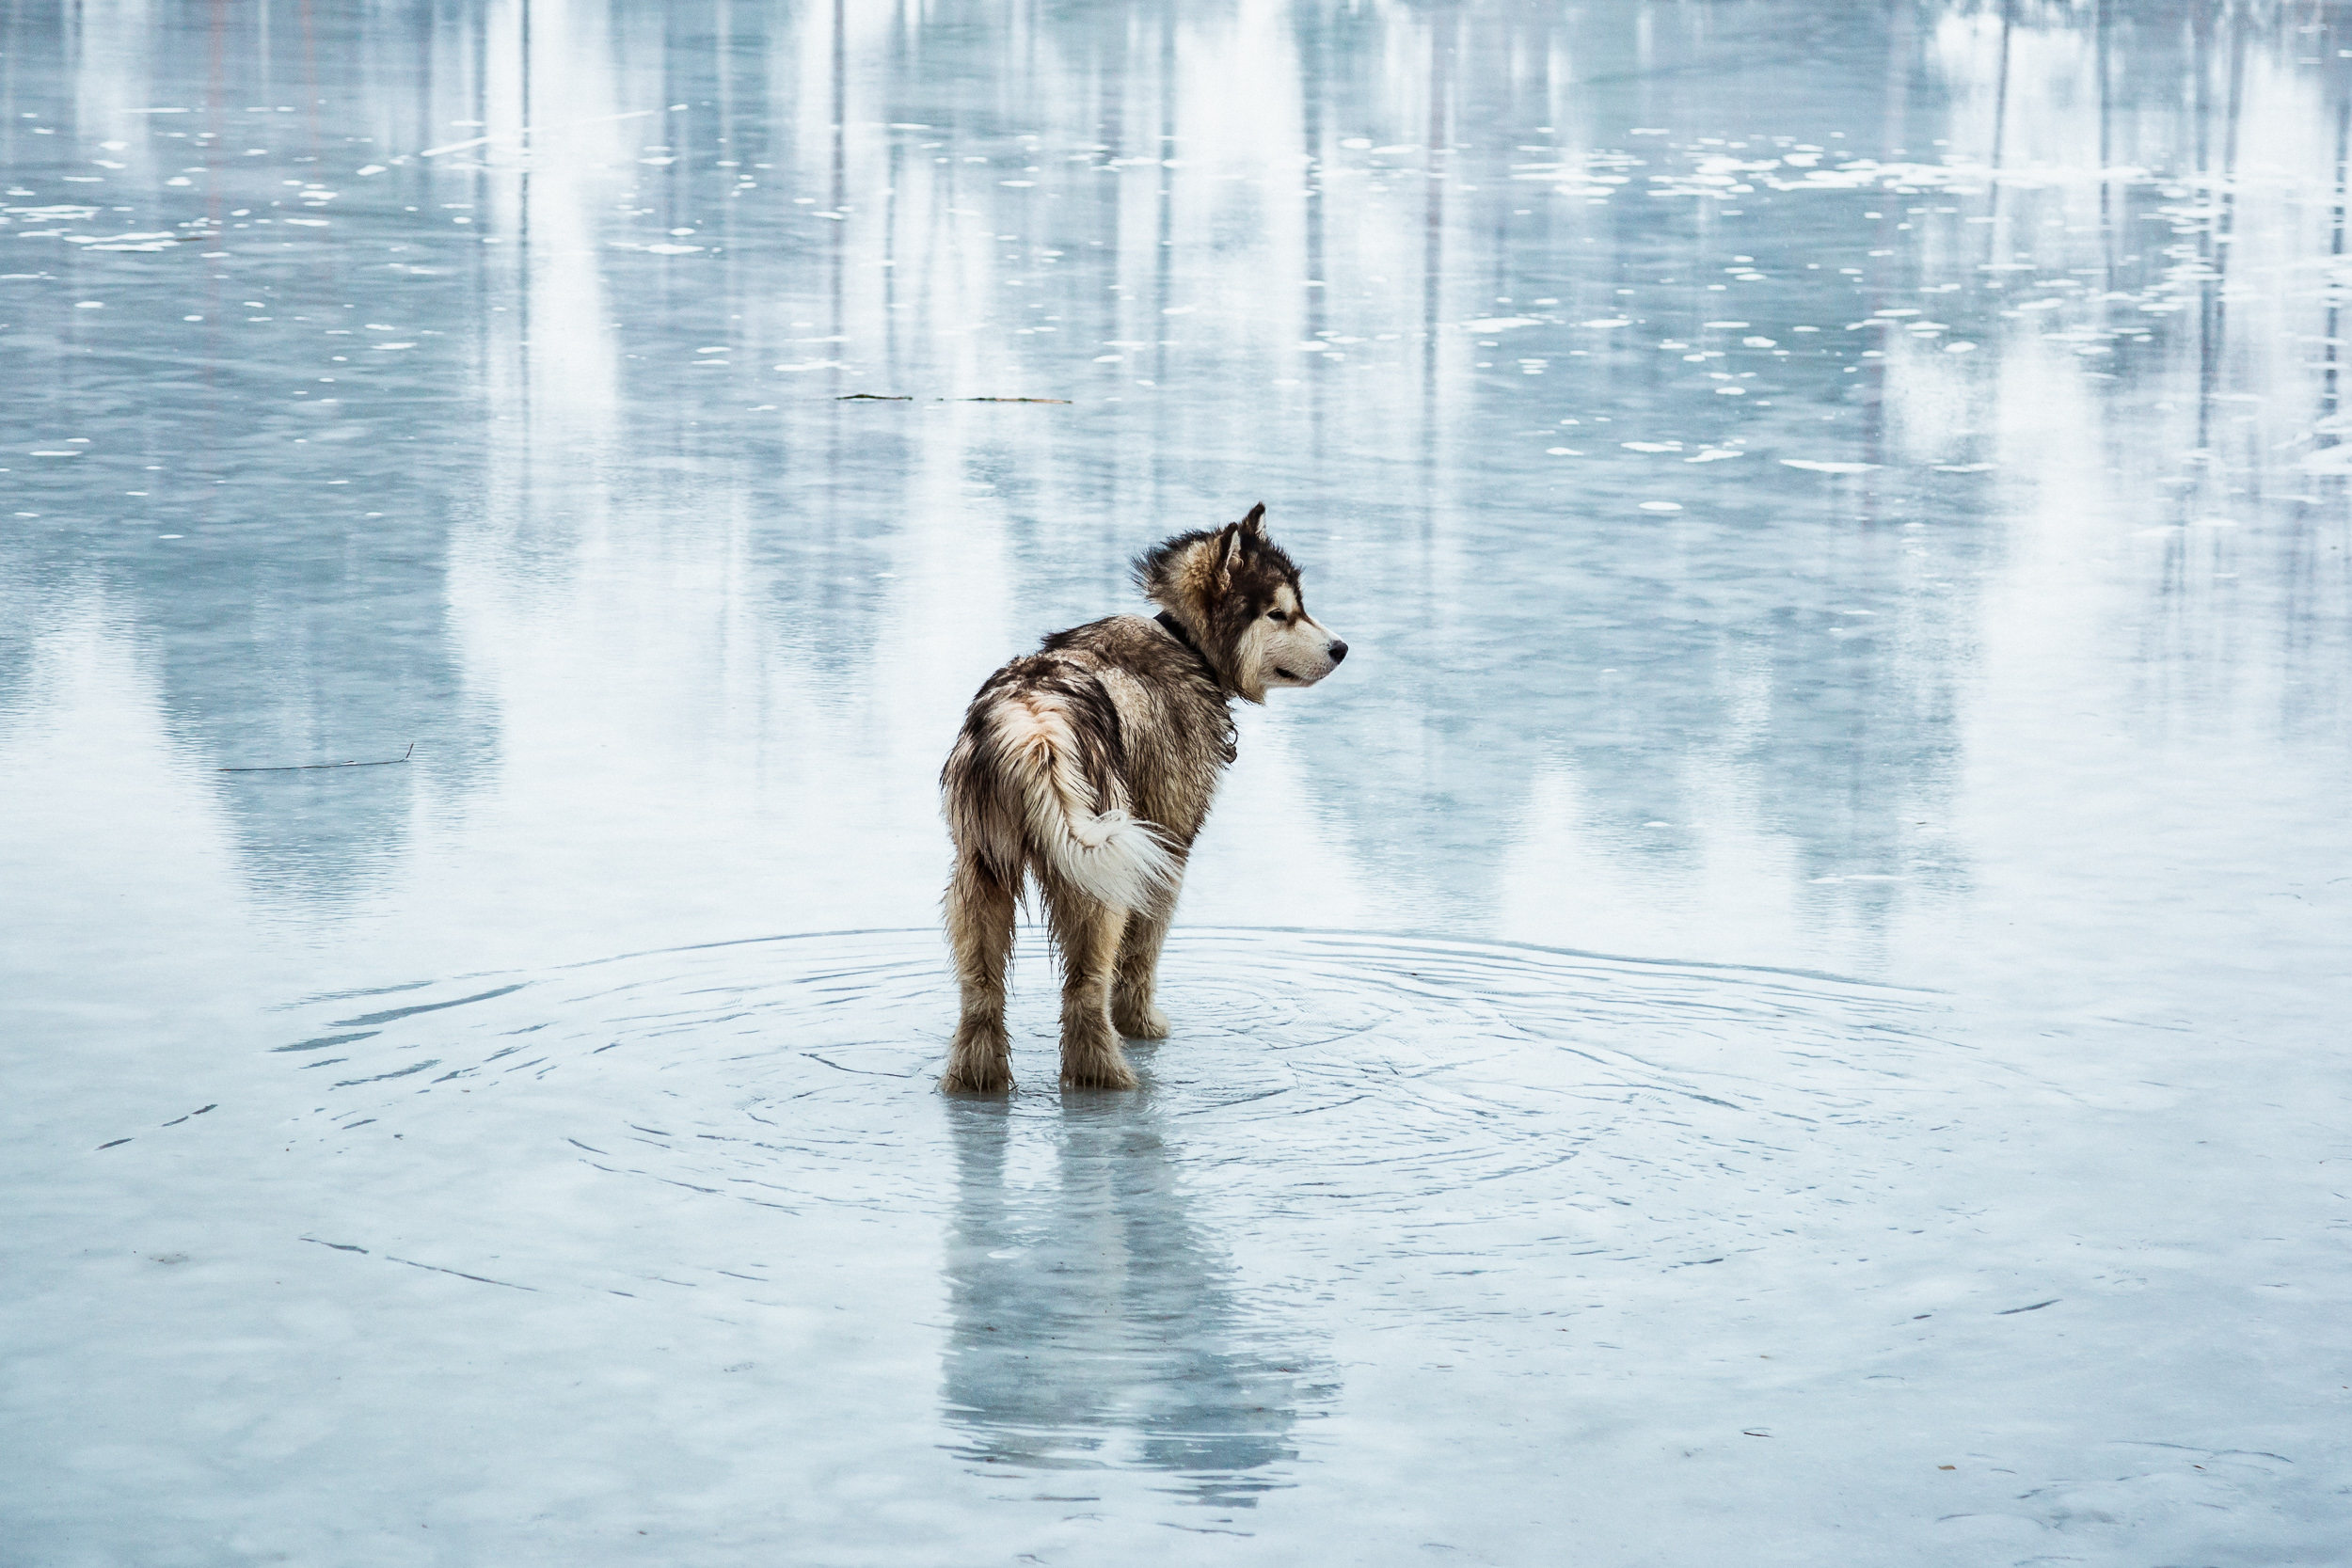 02-alaskan-malamute-dog-on-ice-anna-elina-lahti-photographer.jpg